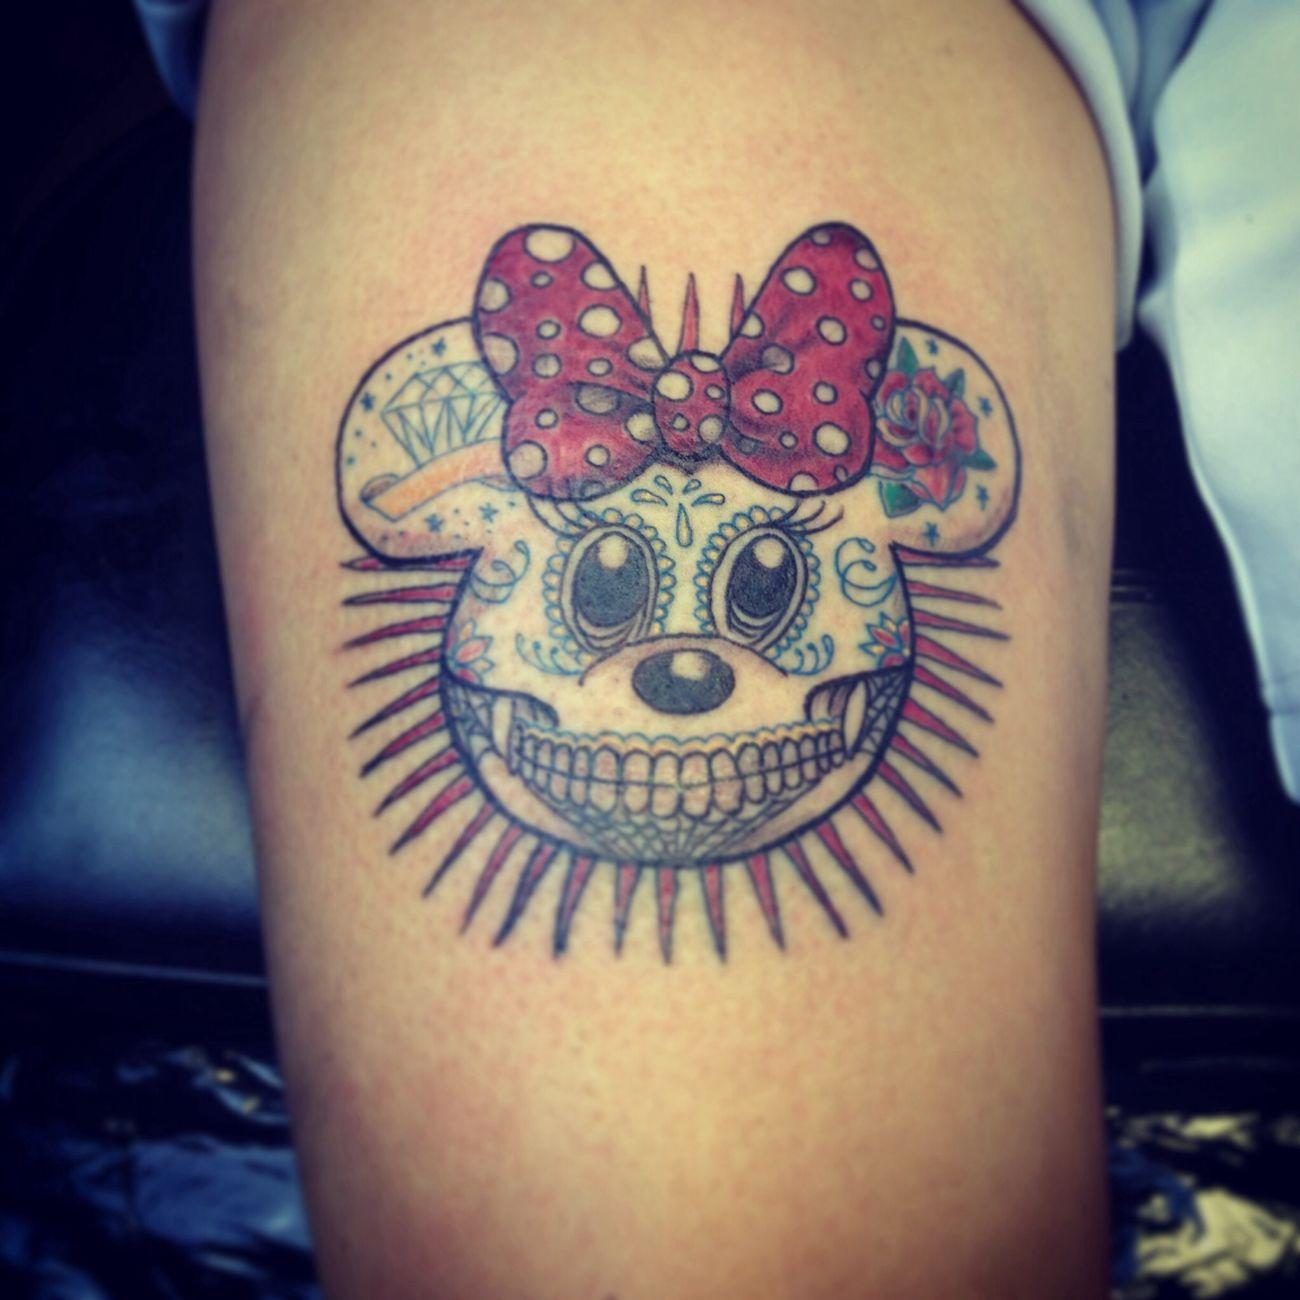 Minnie Calavera Tattoo Getting Inked No Pain, No Gain